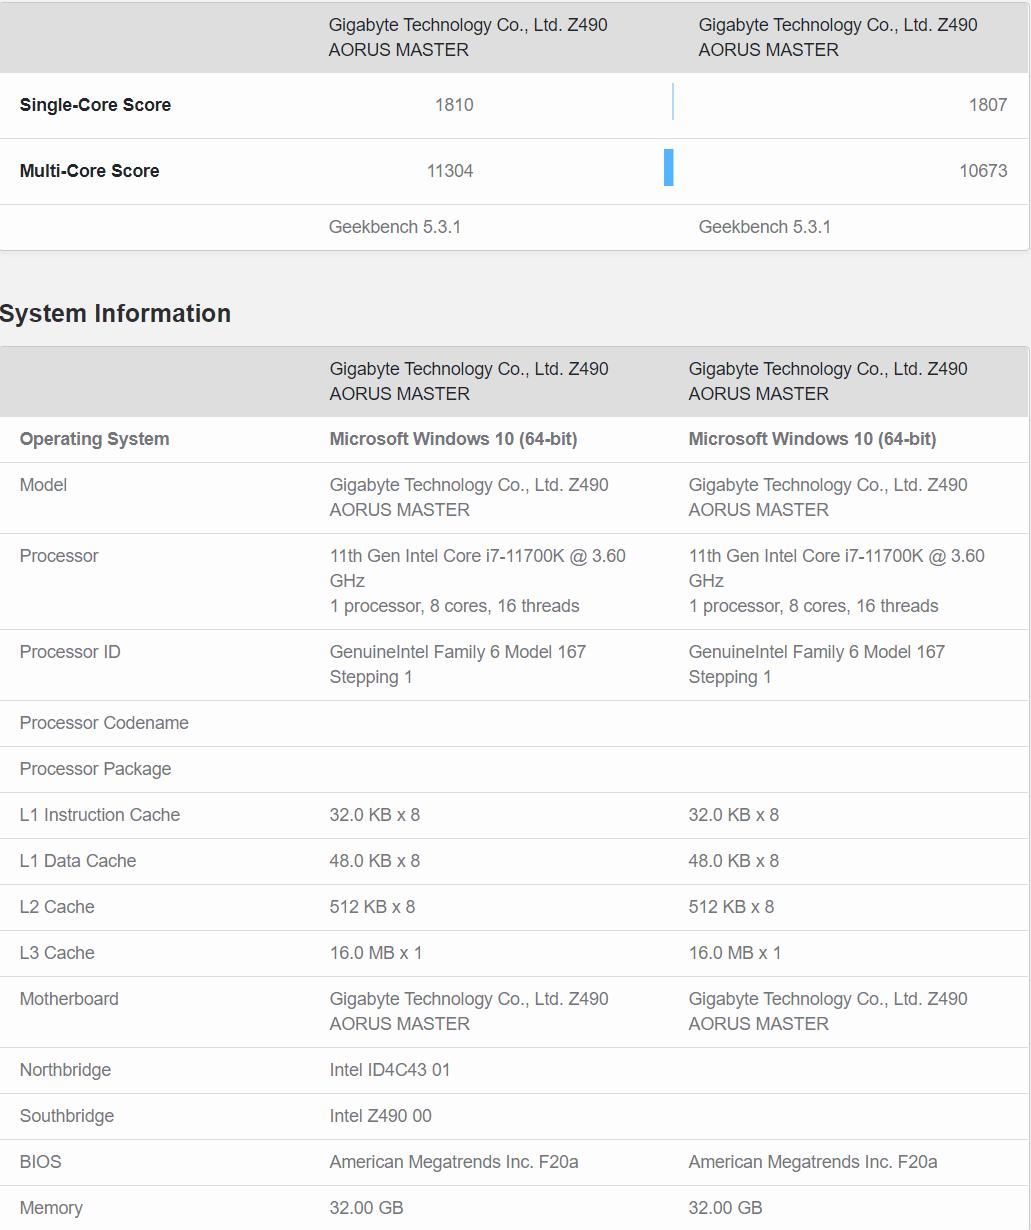 intel-core-i7-11700k-8-core-rocket-lake-desktop-cpu-benchmark-leak-vs-amd-ryzen-7-5800x-_1